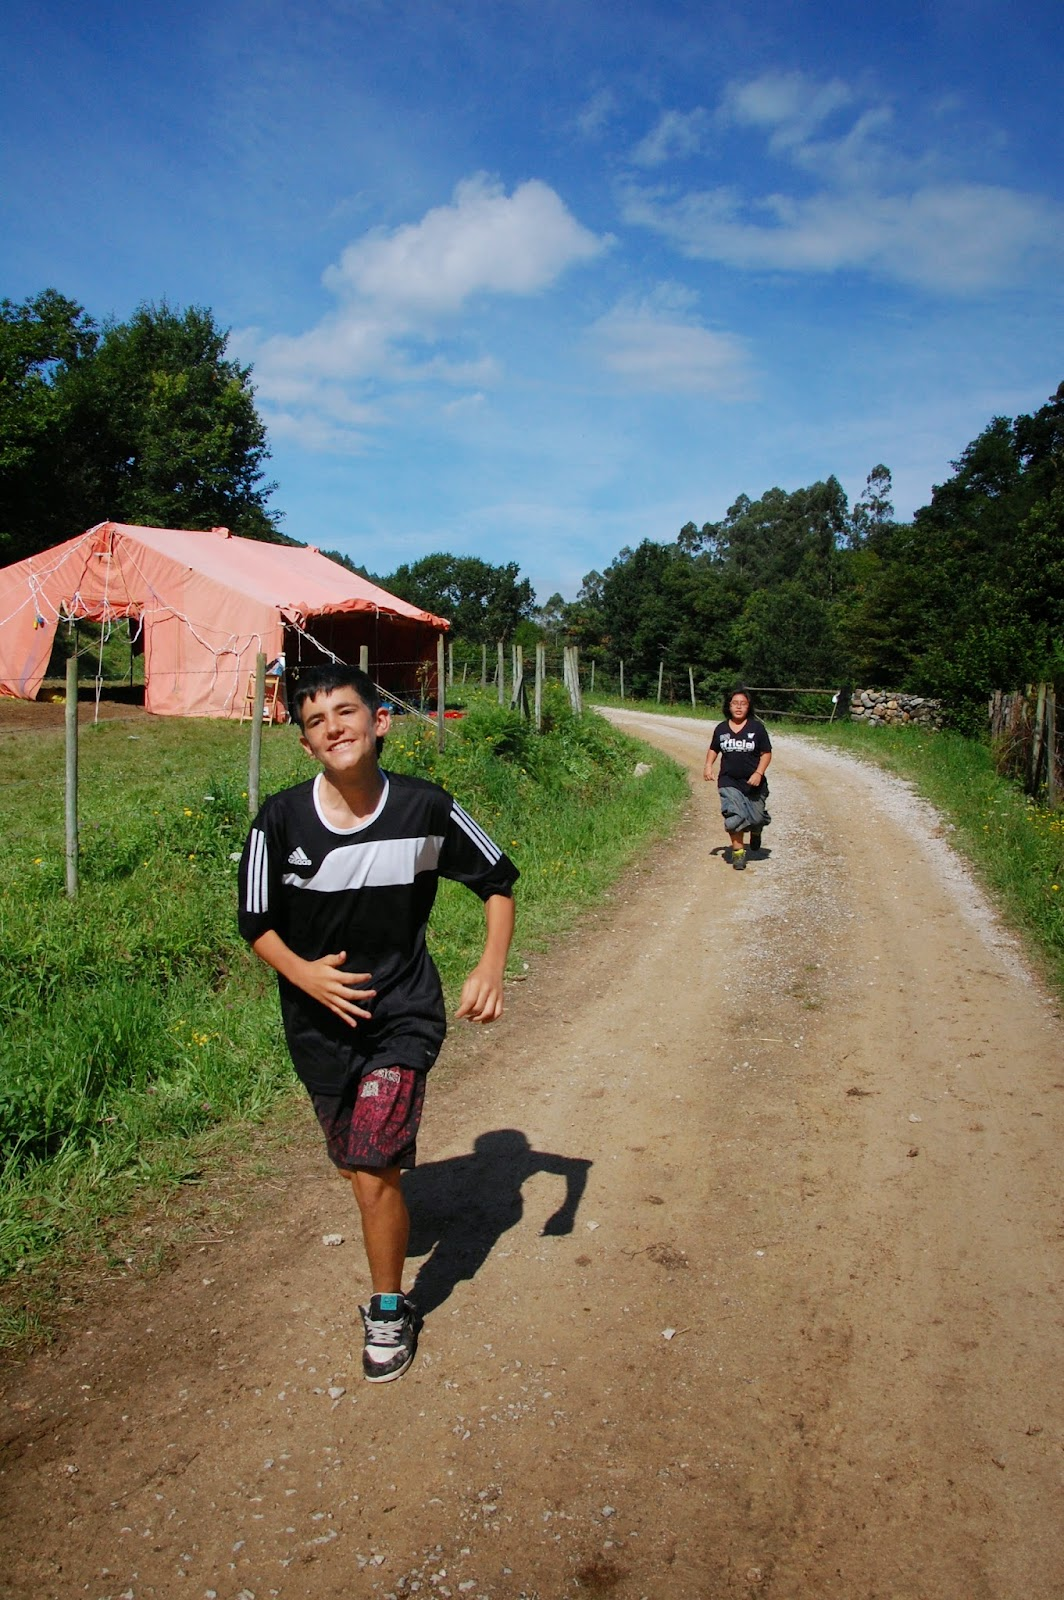 Campaments Estiu RolandKing 2011 - DSC_0134.jpg